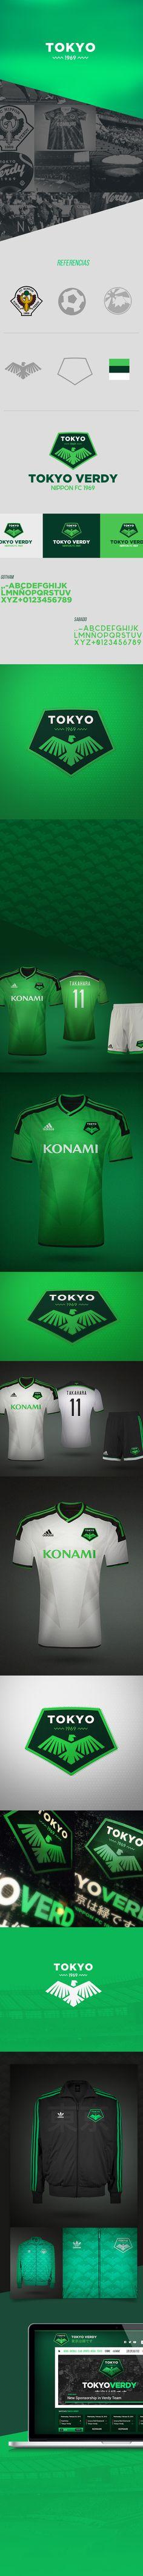 J-League · Tokyo Verdy on Behance Tokyo Verdy, J League, Logo Design, Graphic Design, Sports Logo, Web Design Inspiration, Herb, Identity, Men's Fashion